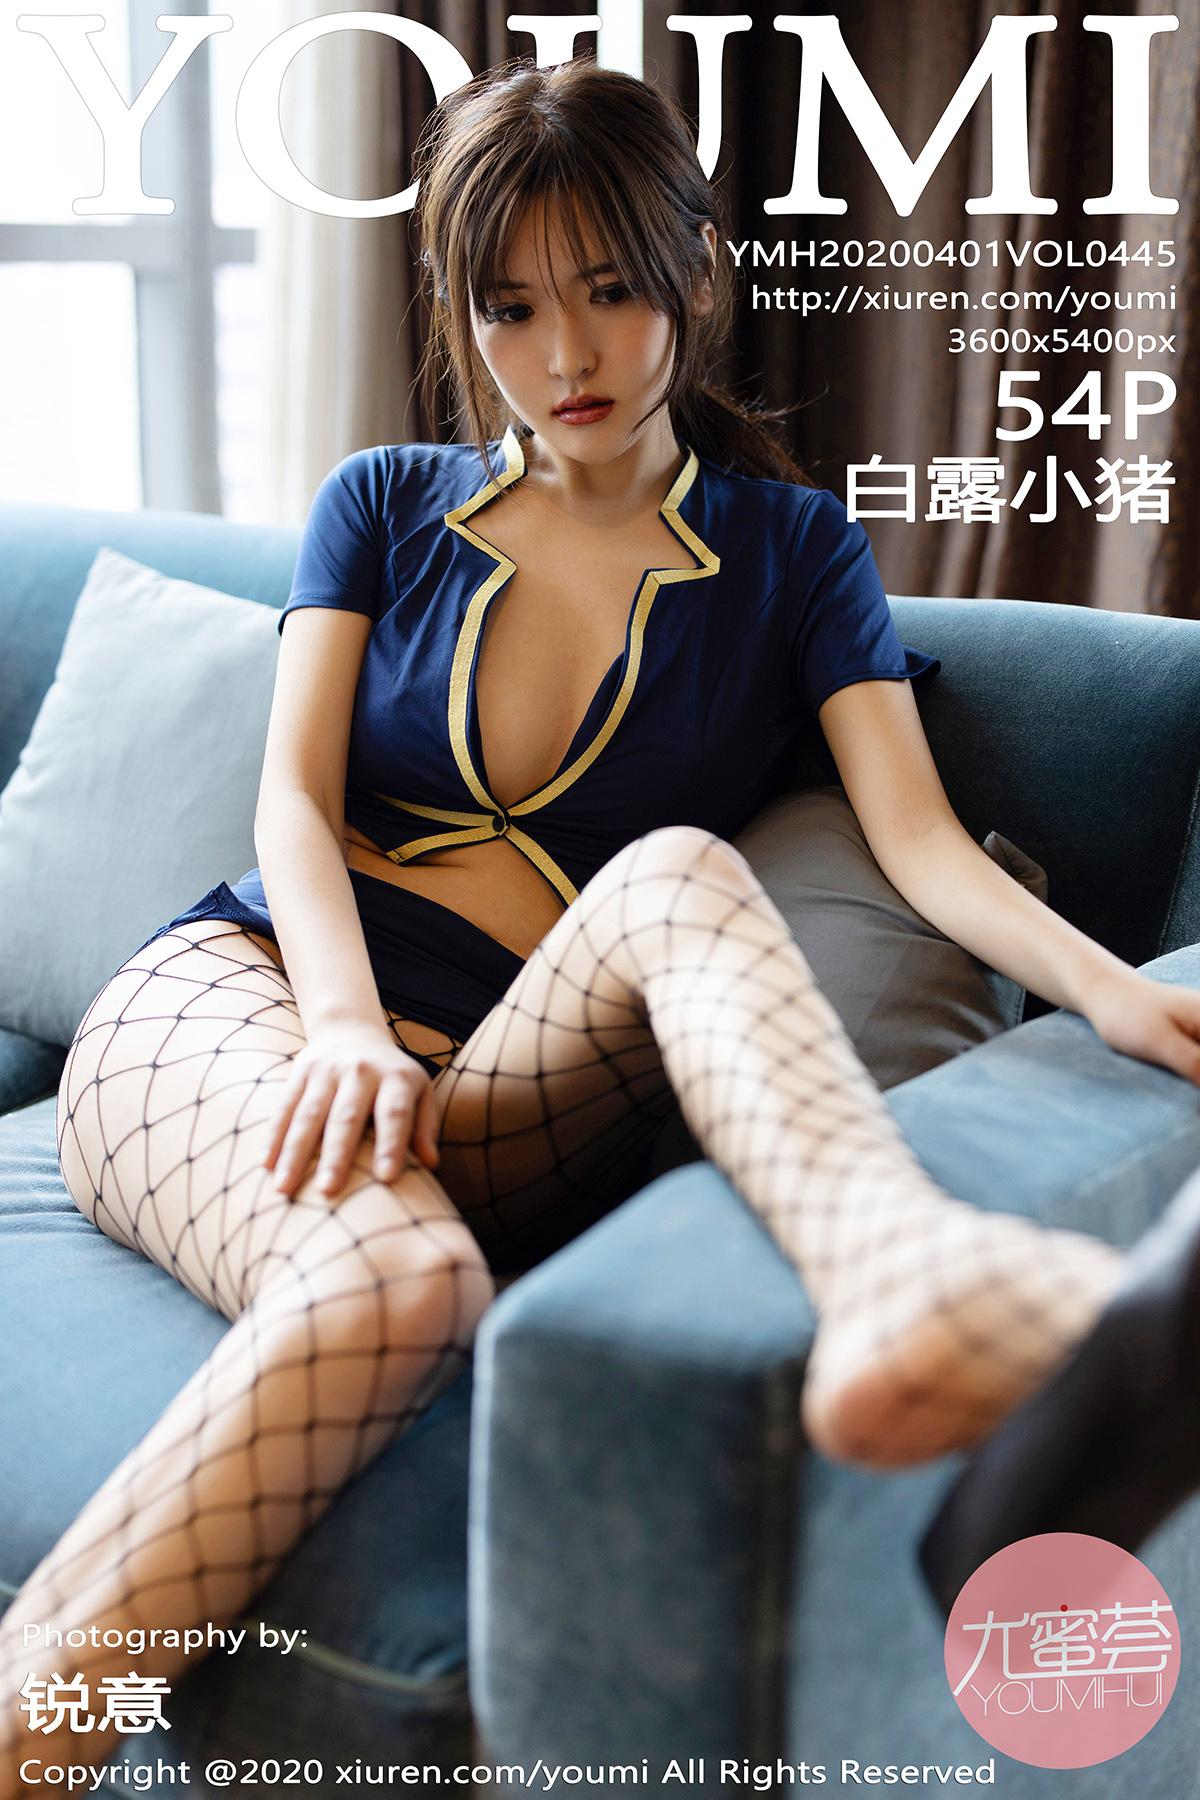 [YOUMI尤蜜荟]2020.04.01 VOL.445 白露小猪 网袜 制服[/219MB]